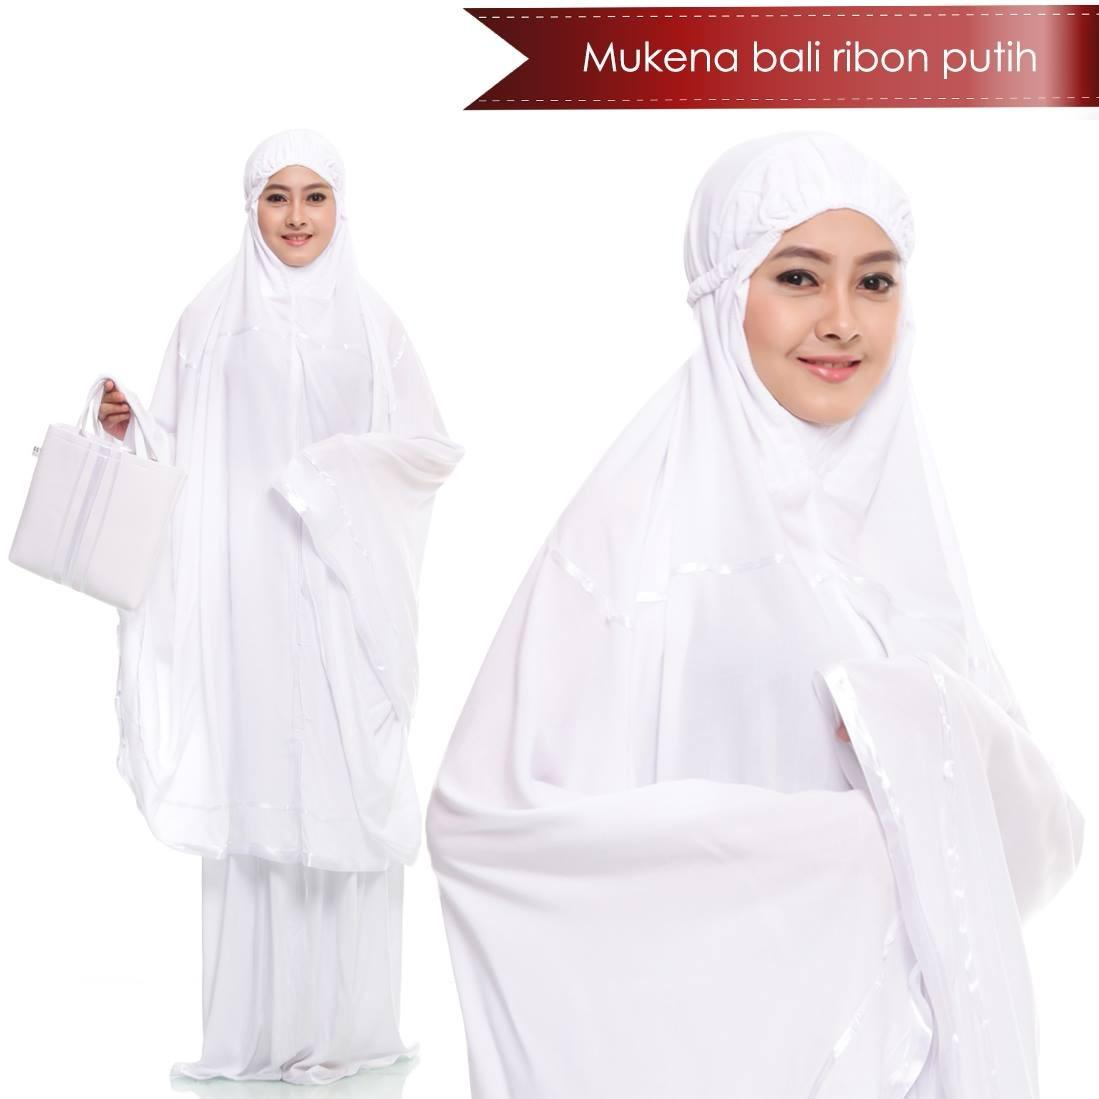 Mukena Bali Ribon Polos Putih